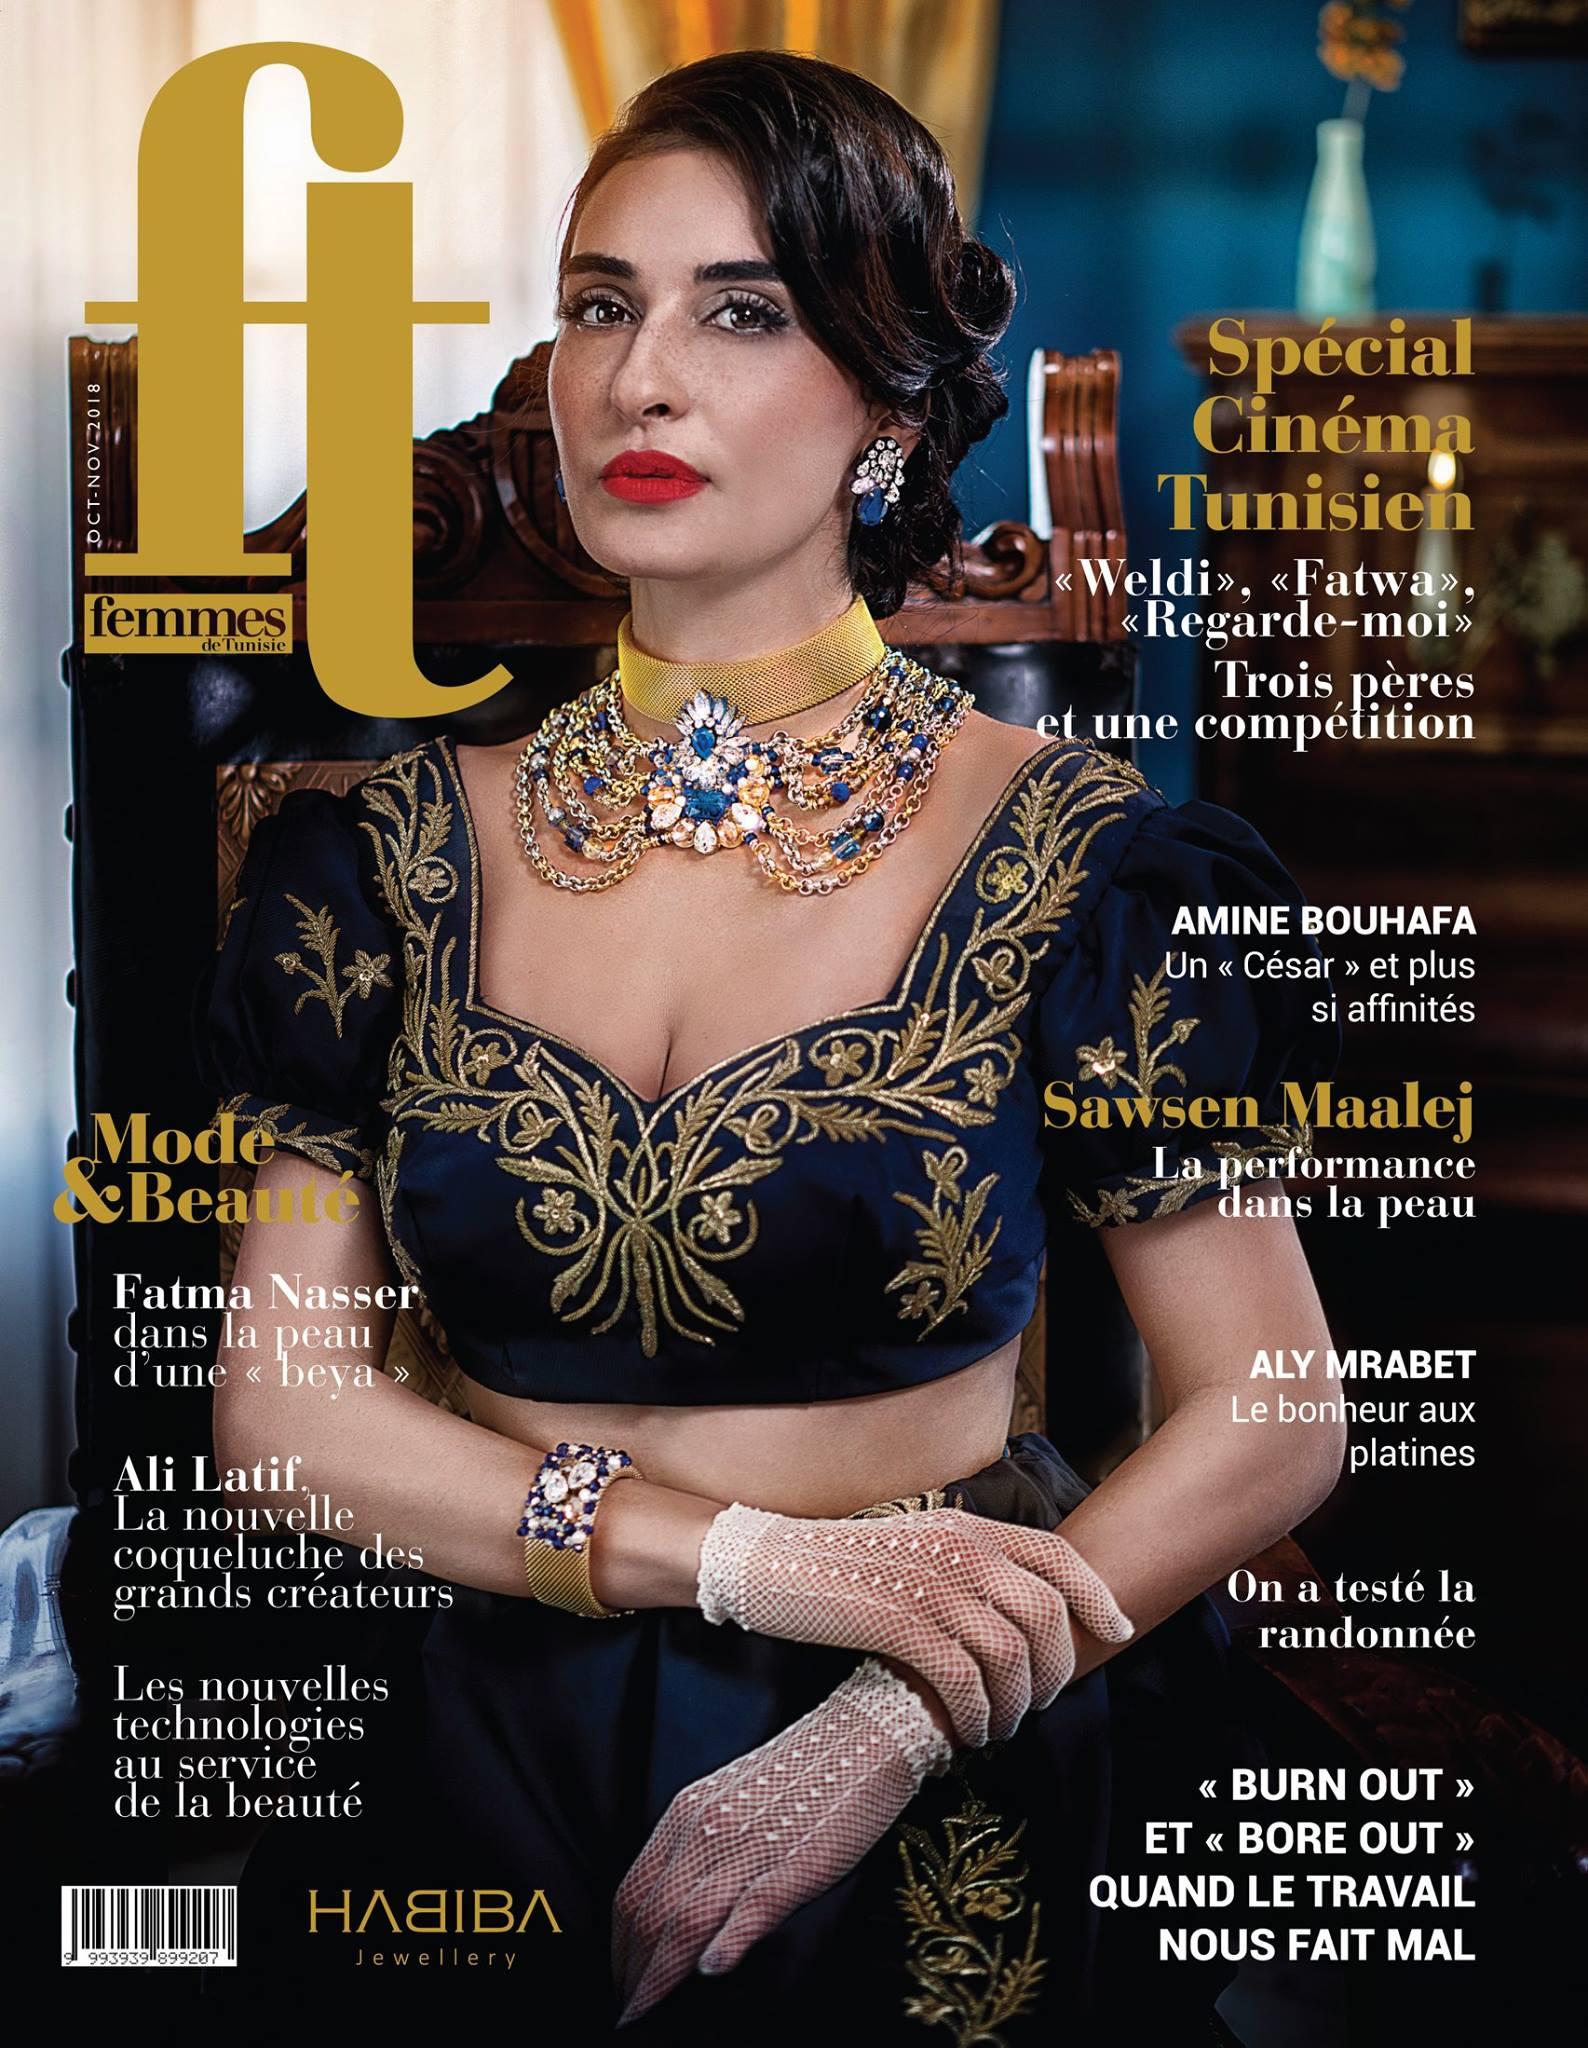 femme-de-tunisie magazine, habiba jewelery